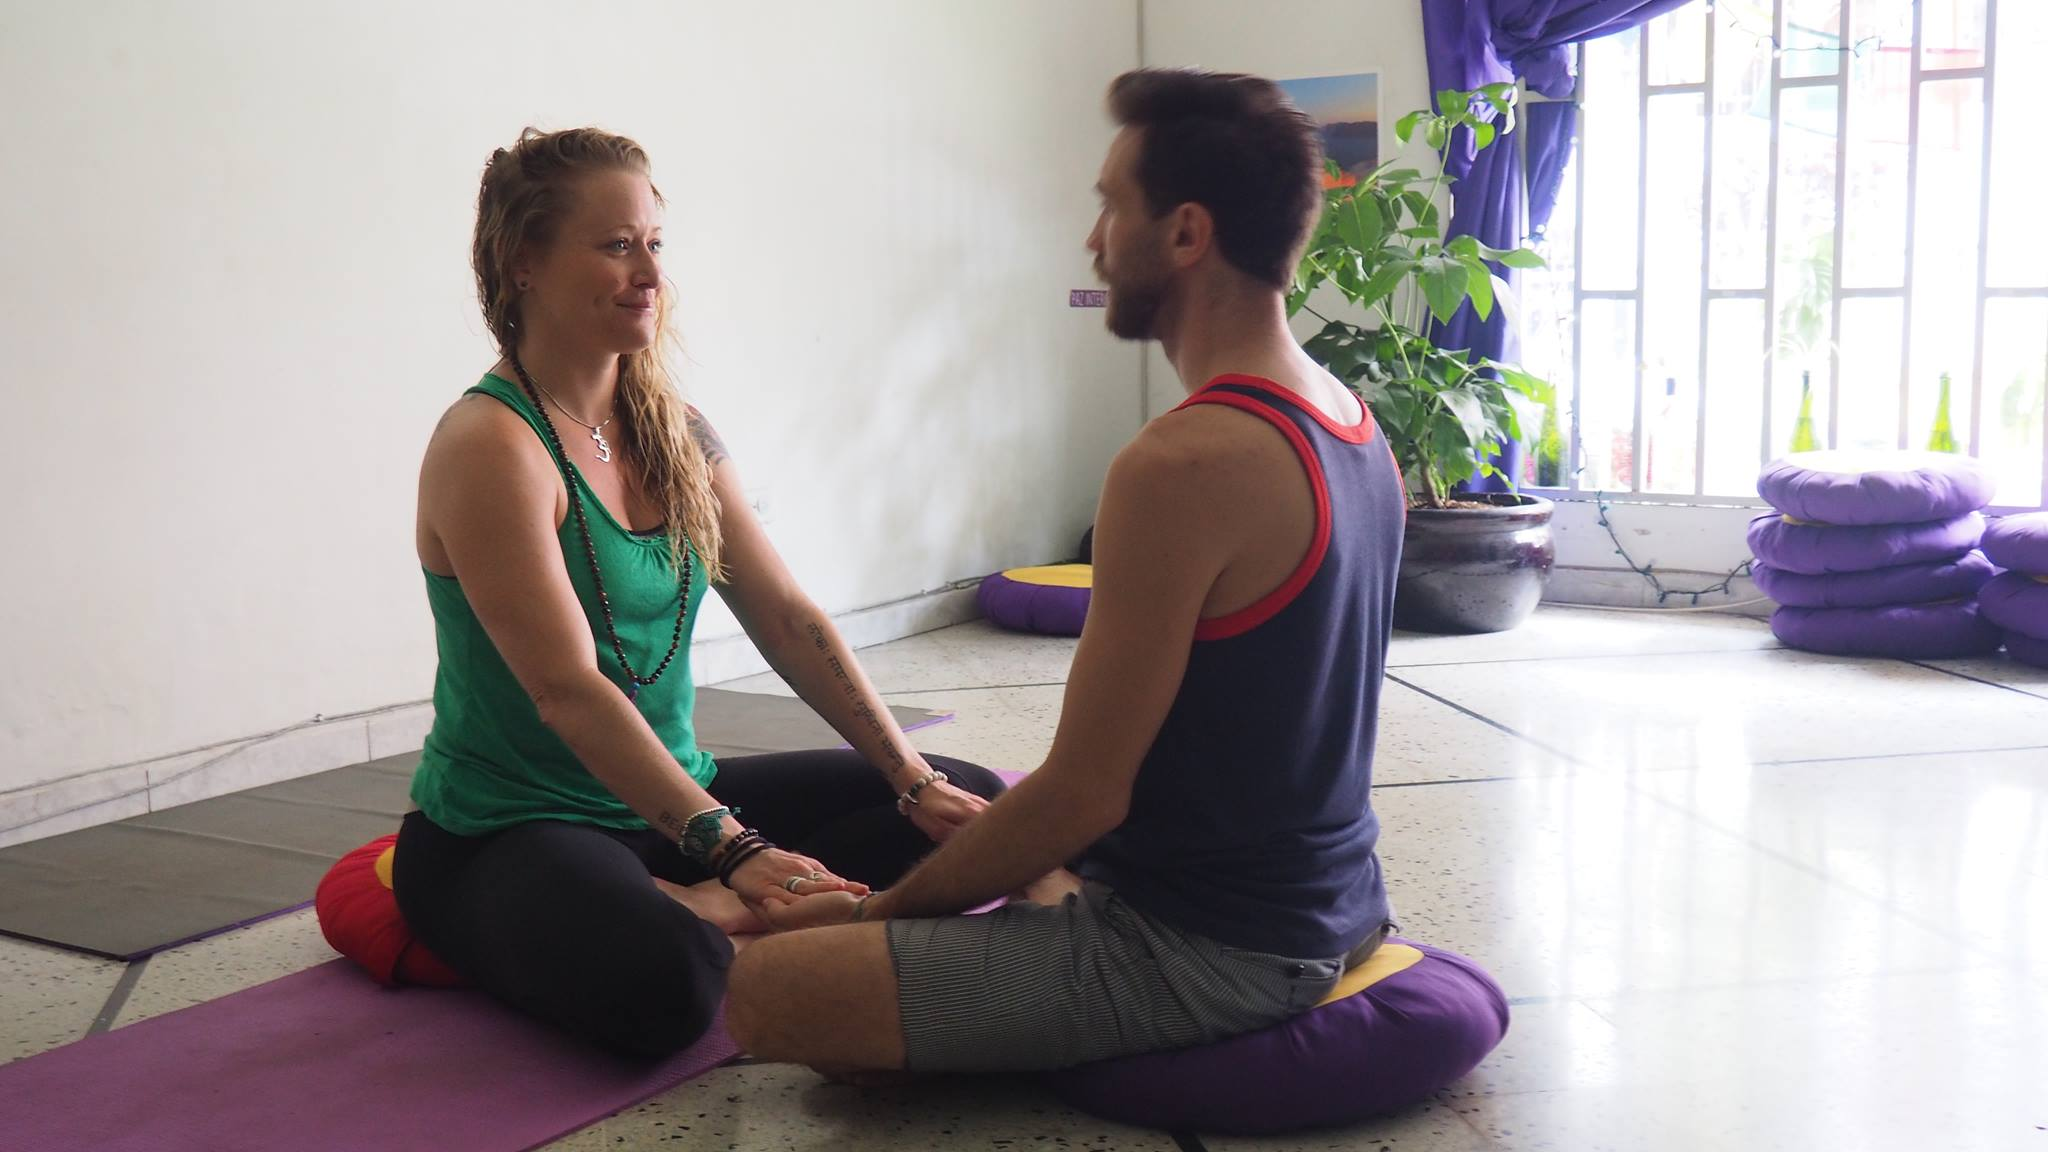 Yoga Internship Program, Medellín, Colombia, South America - teach and work in a yoga studio - photos February 16